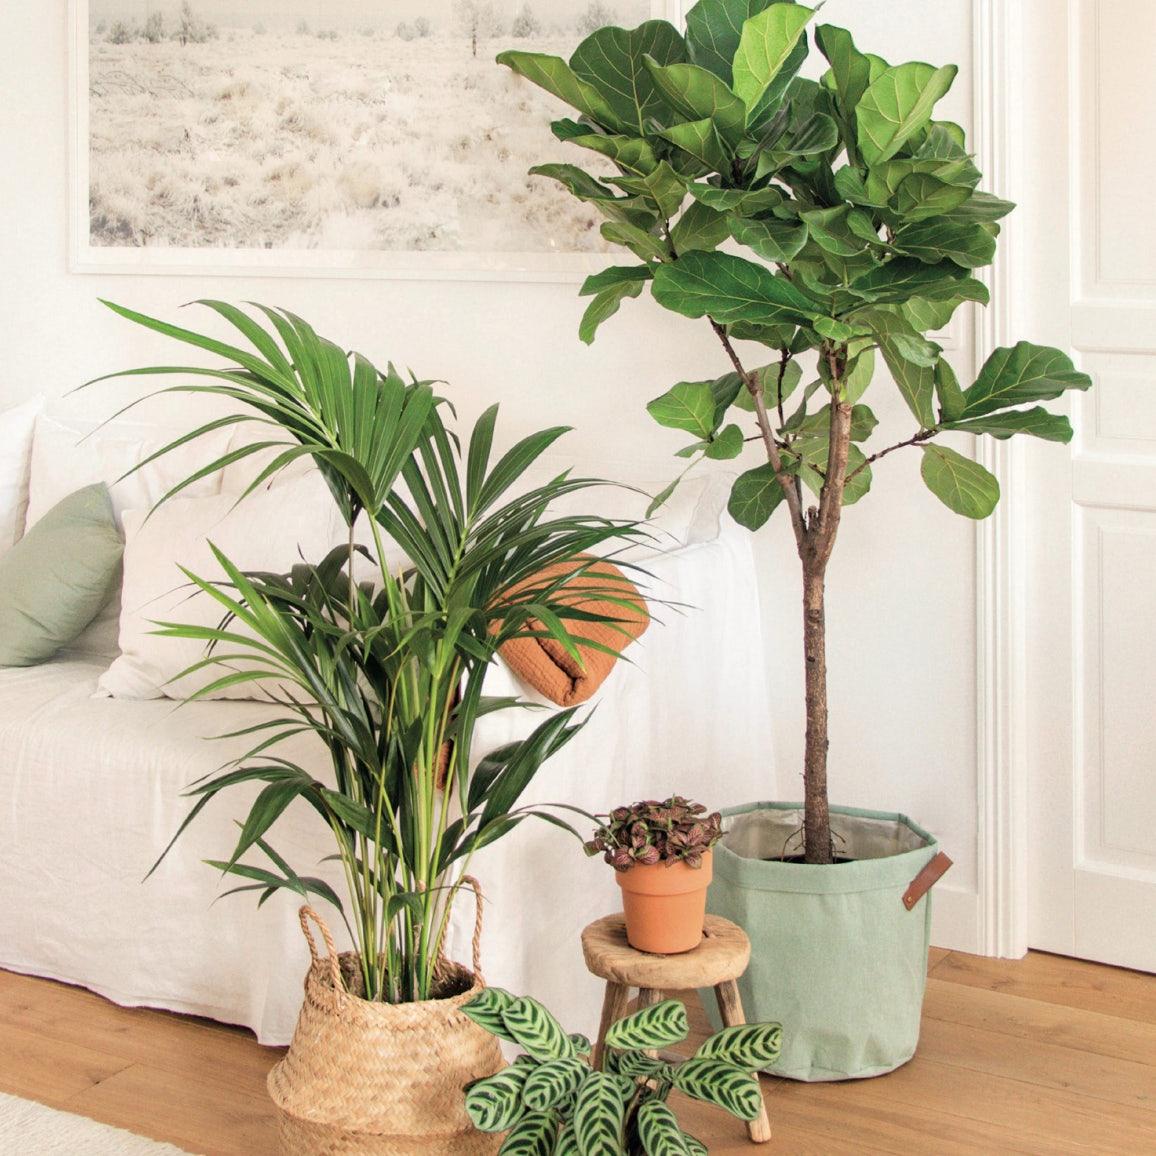 adopter-plante-verte-originale